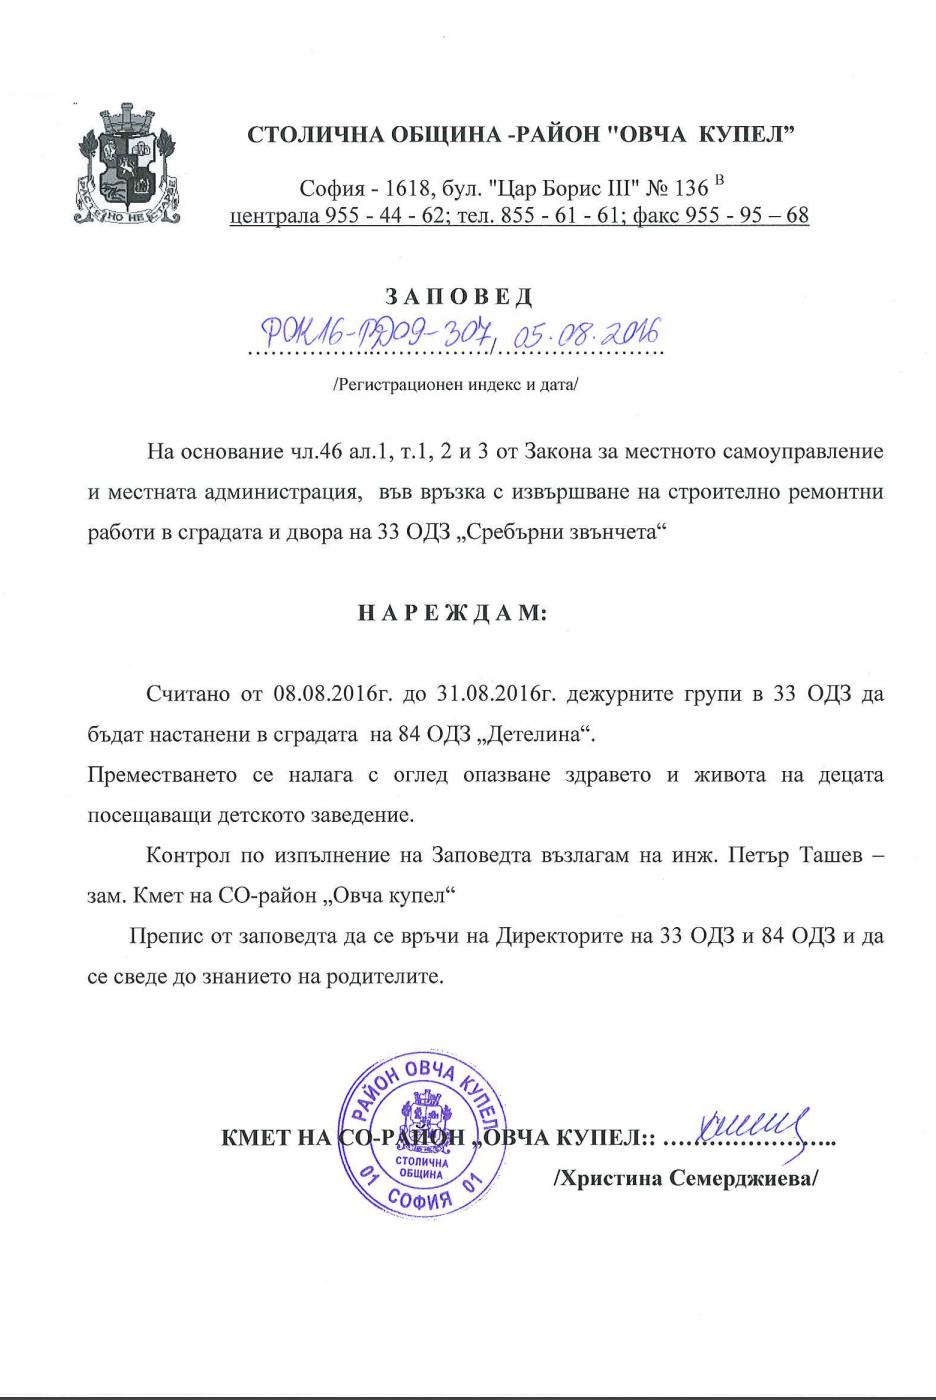 Заповед РОК16-РД09-307/05.08.2016